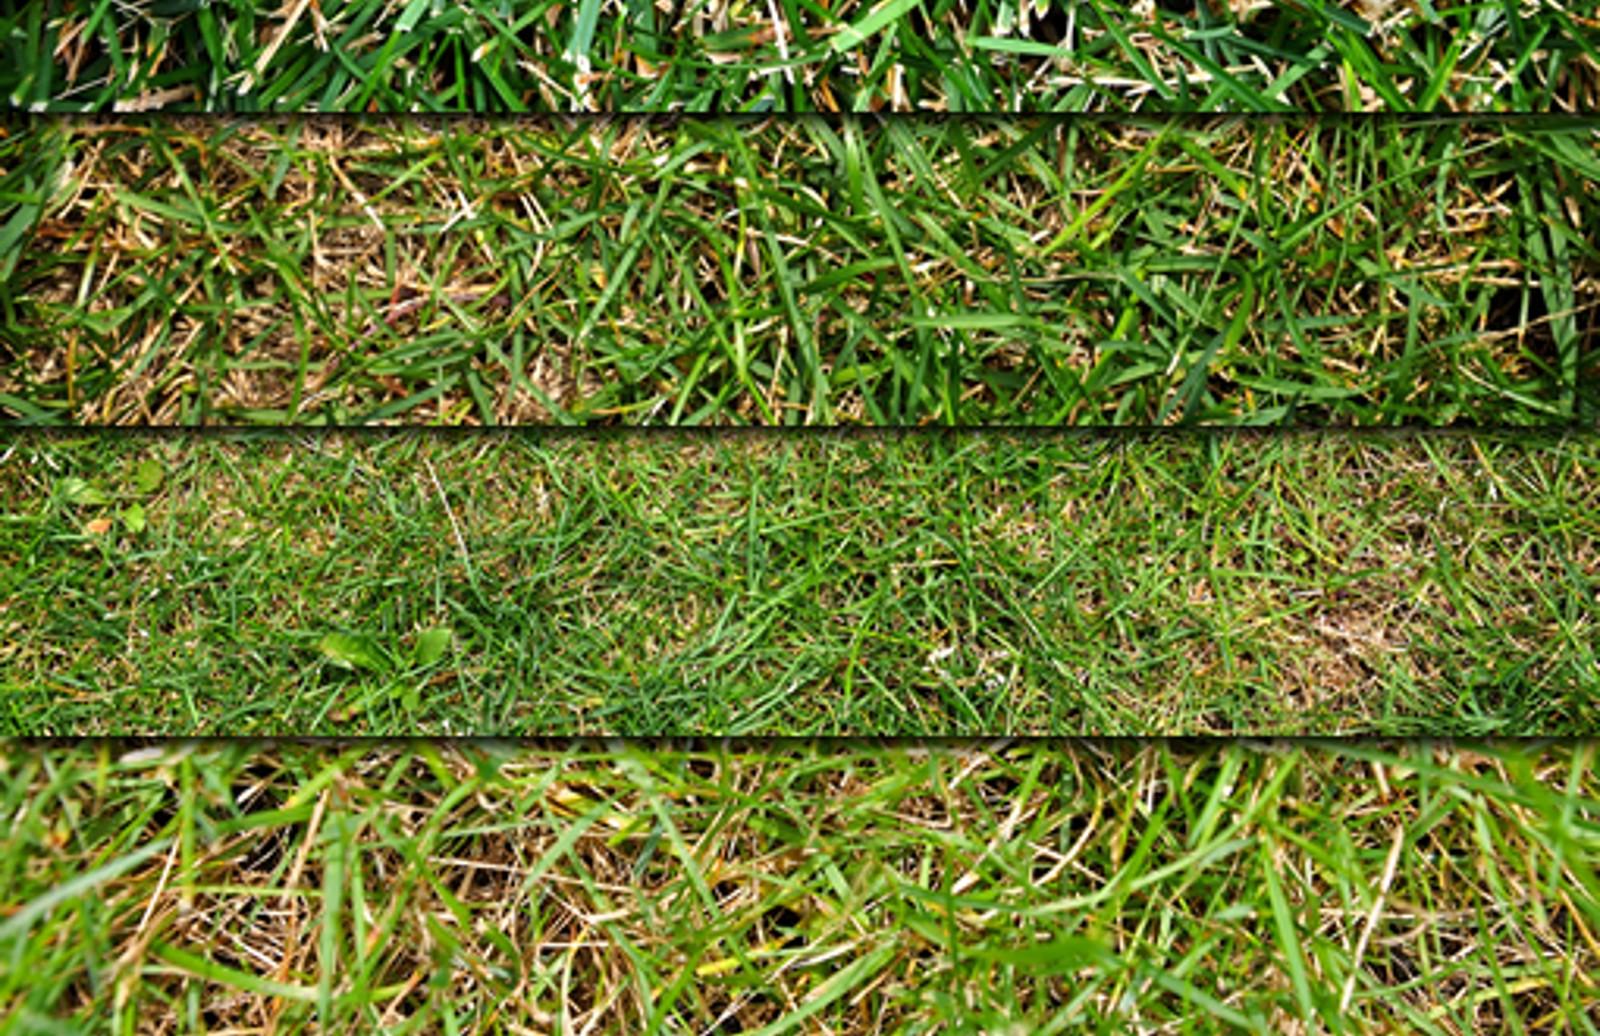 Grass Textures Preview